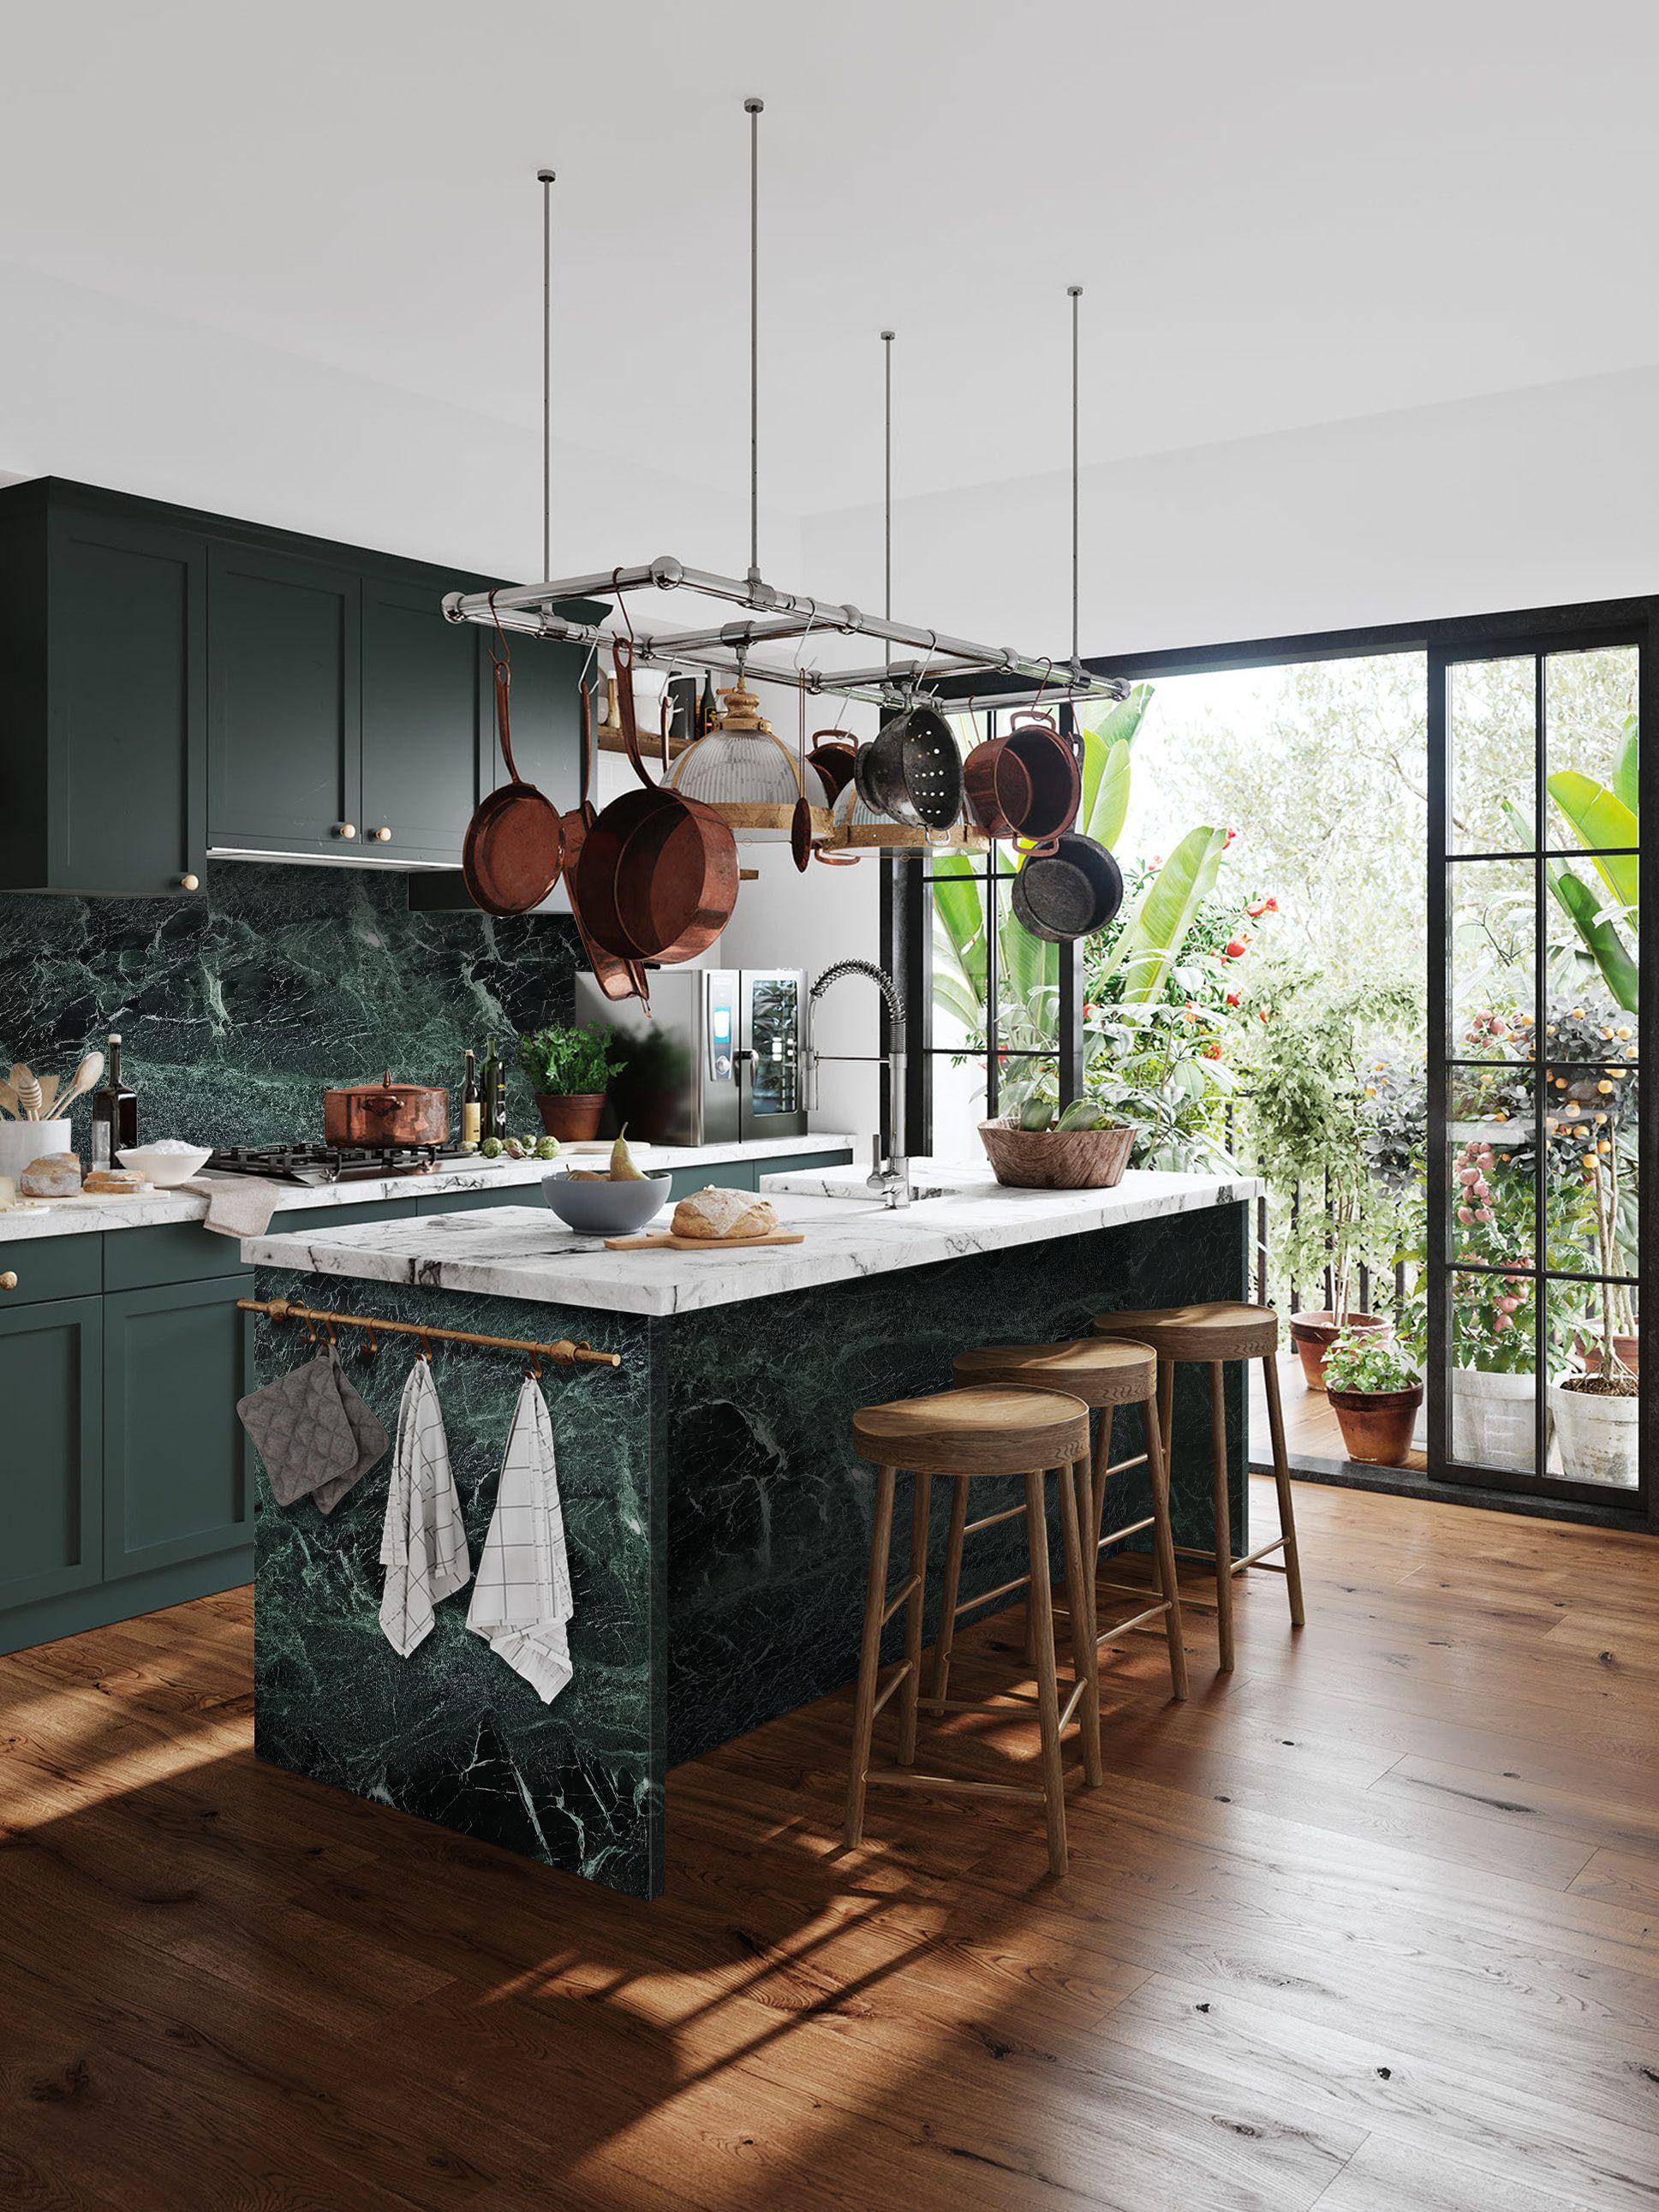 40 kitchen island ideas – the best ways to add style and storage